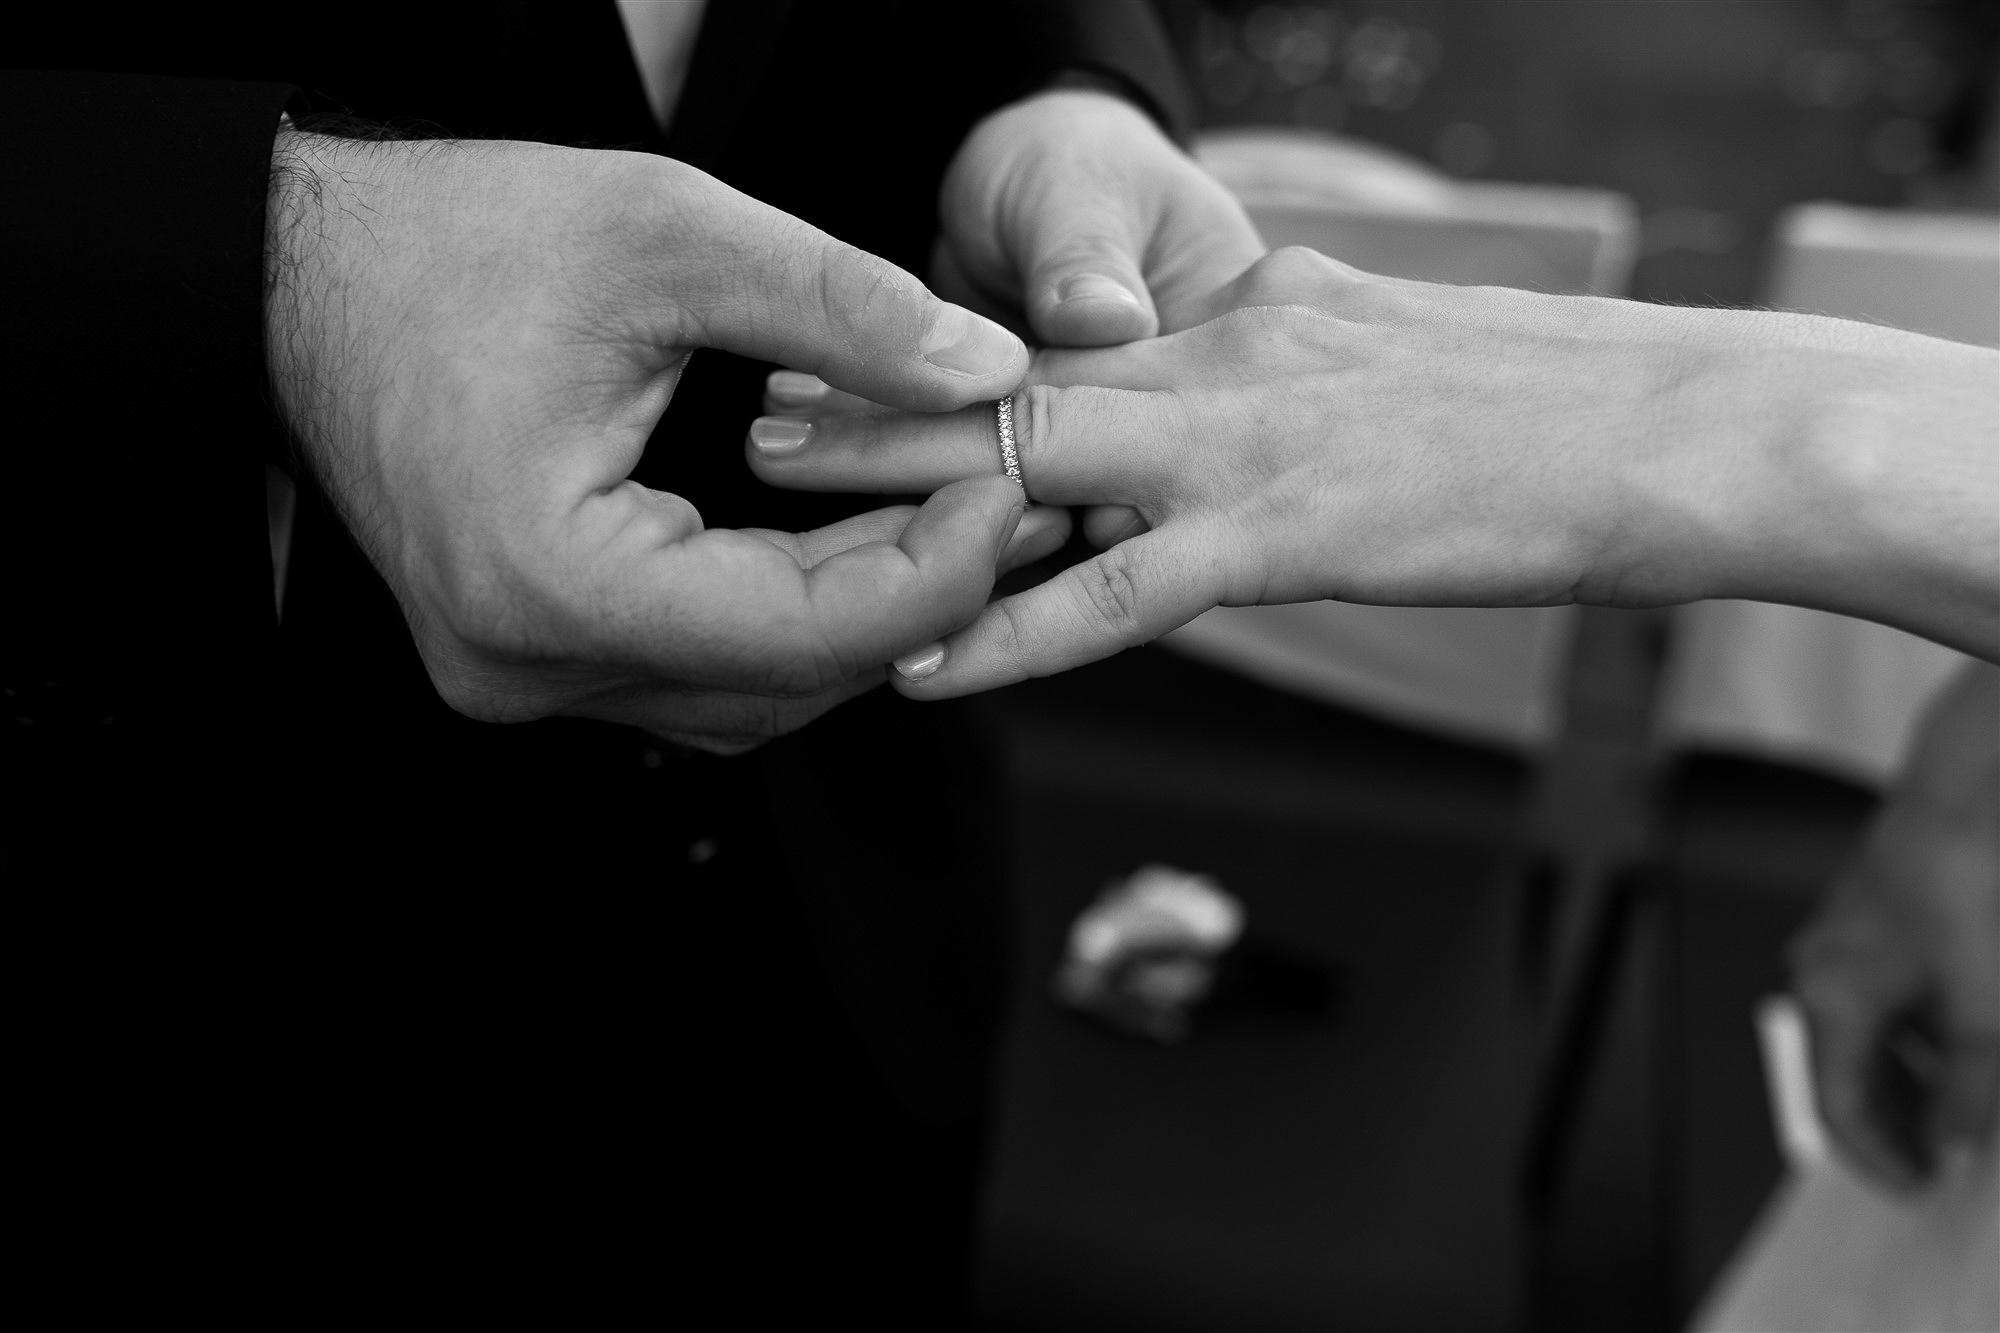 Freie Trauung im Teufelhof Basel - Hochzeitsfotografin